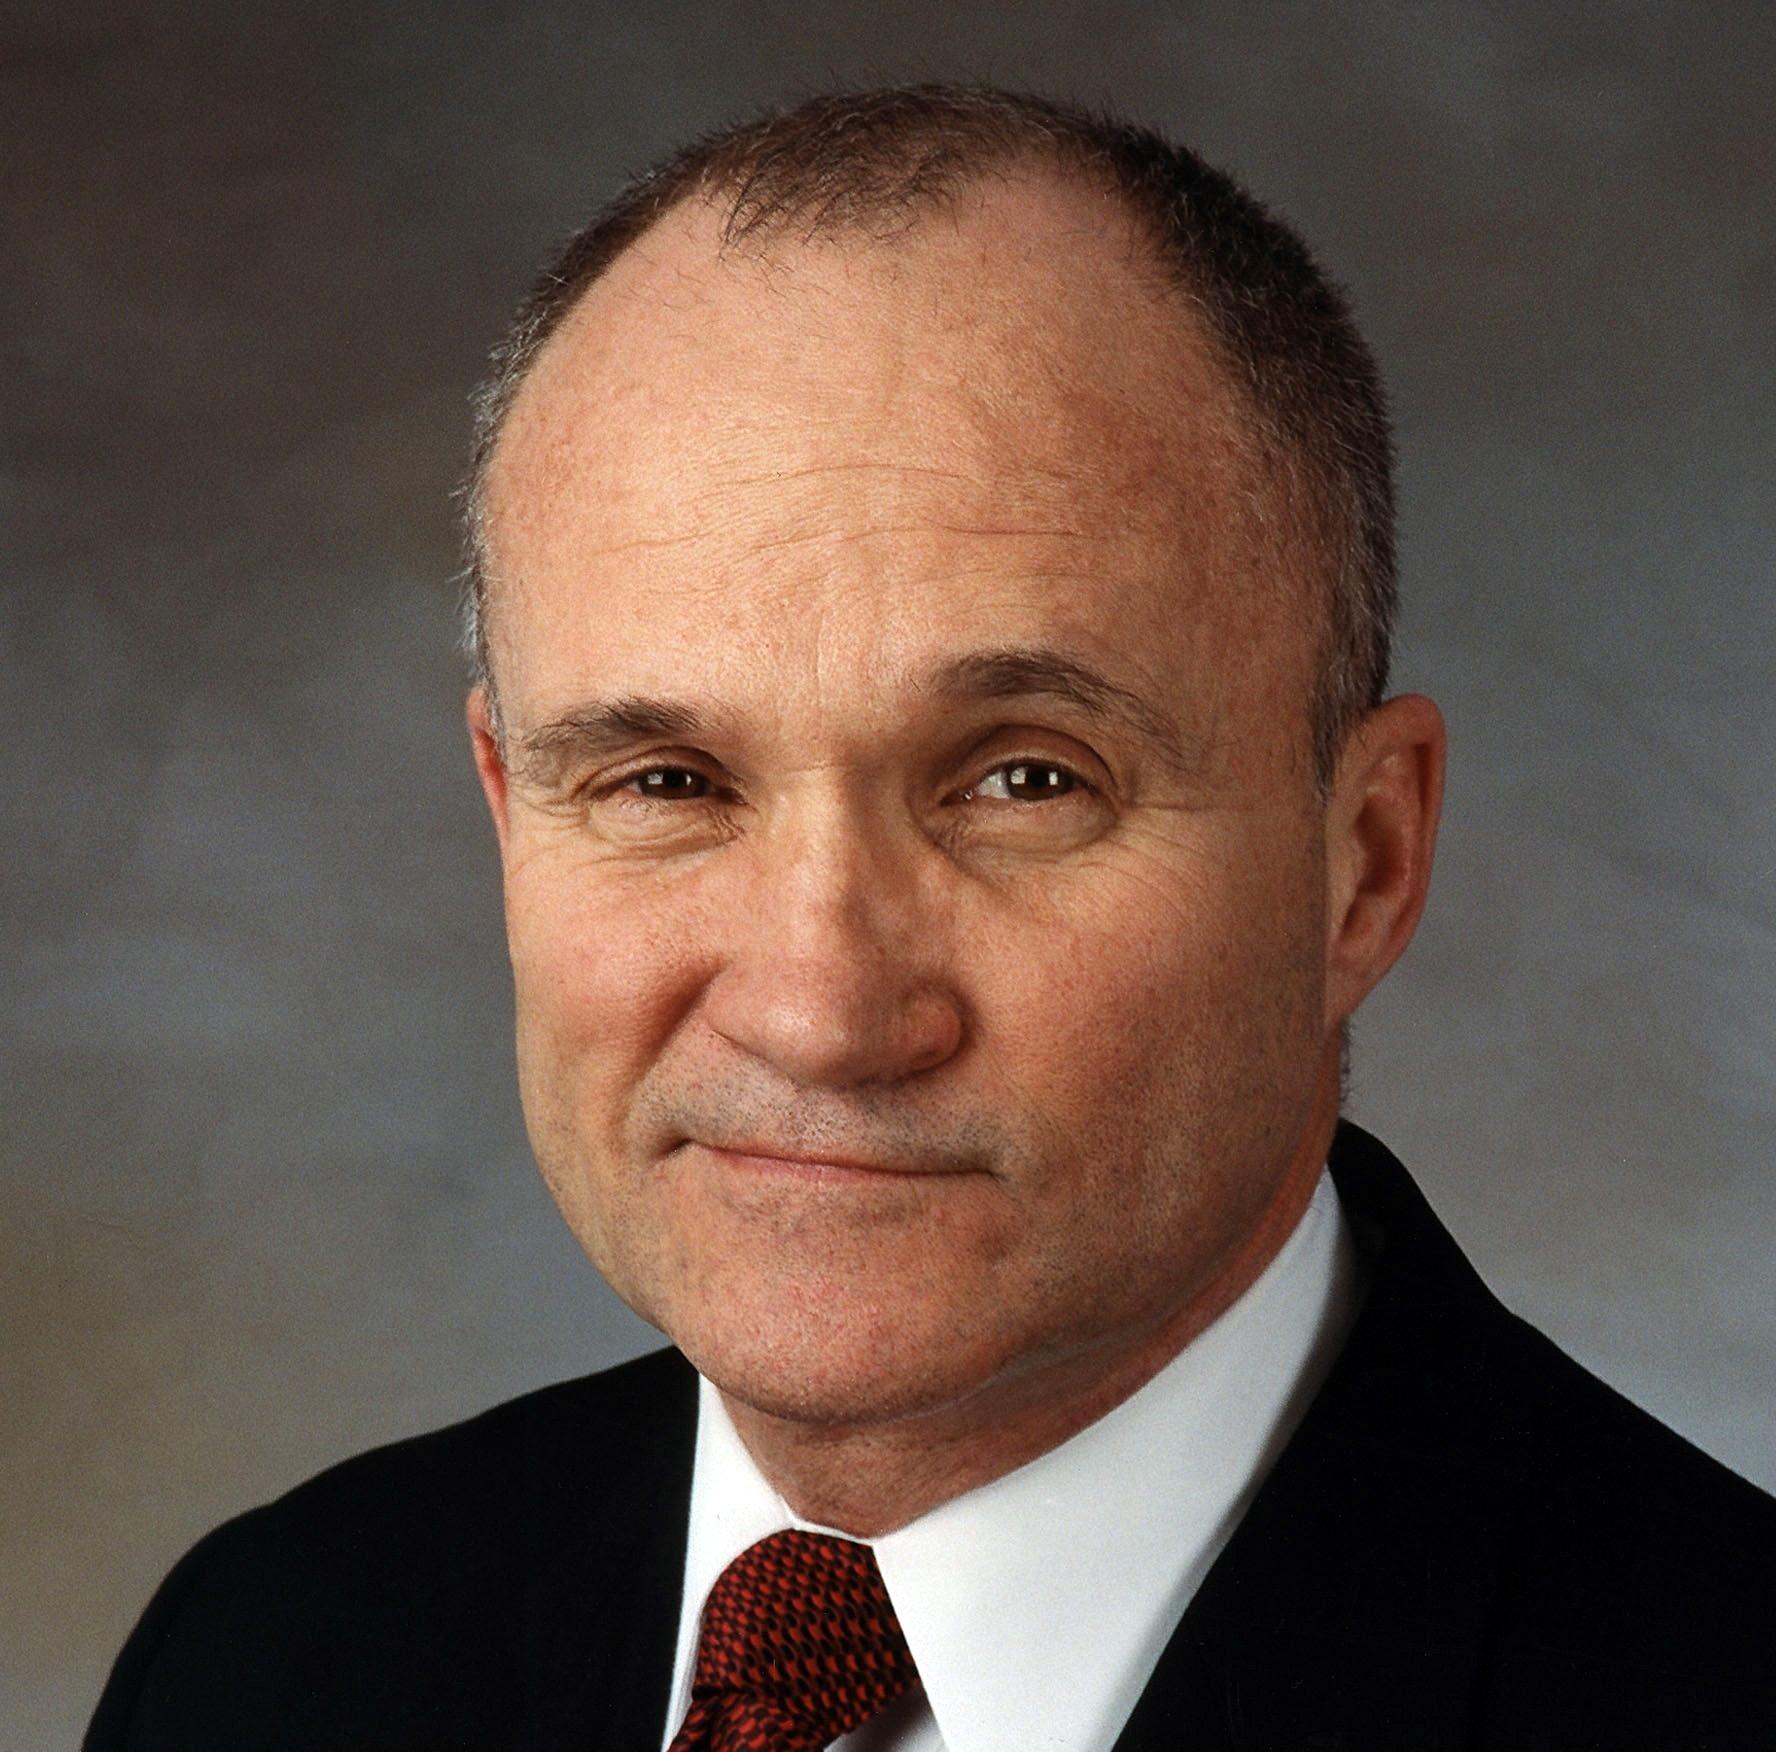 Raymond W. Kelly Net Worth